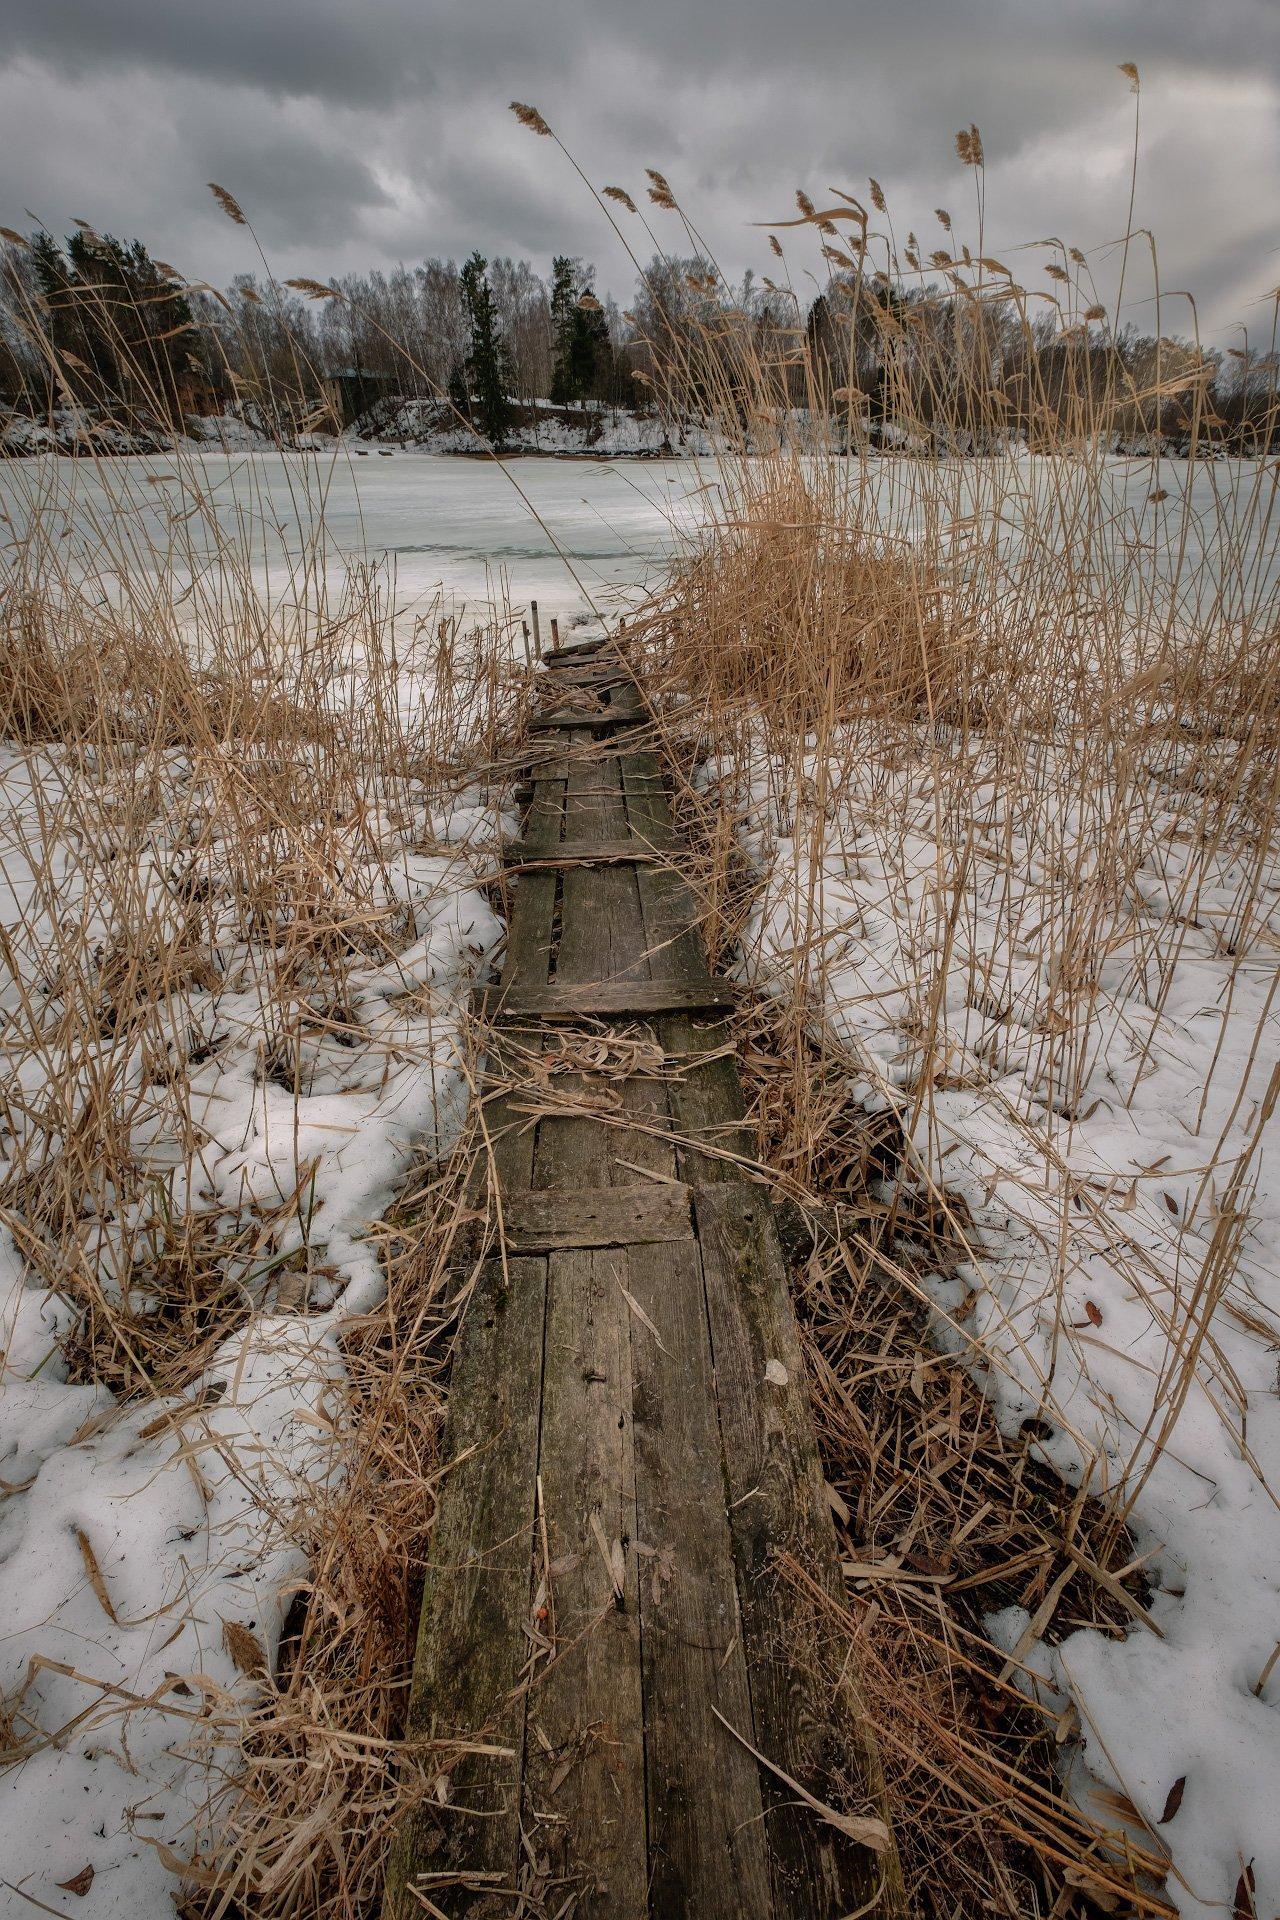 пейзаж, тишково, пирс, лед, снег, трава, камыш, пасмурно, весна, апрель, Андрей Чиж